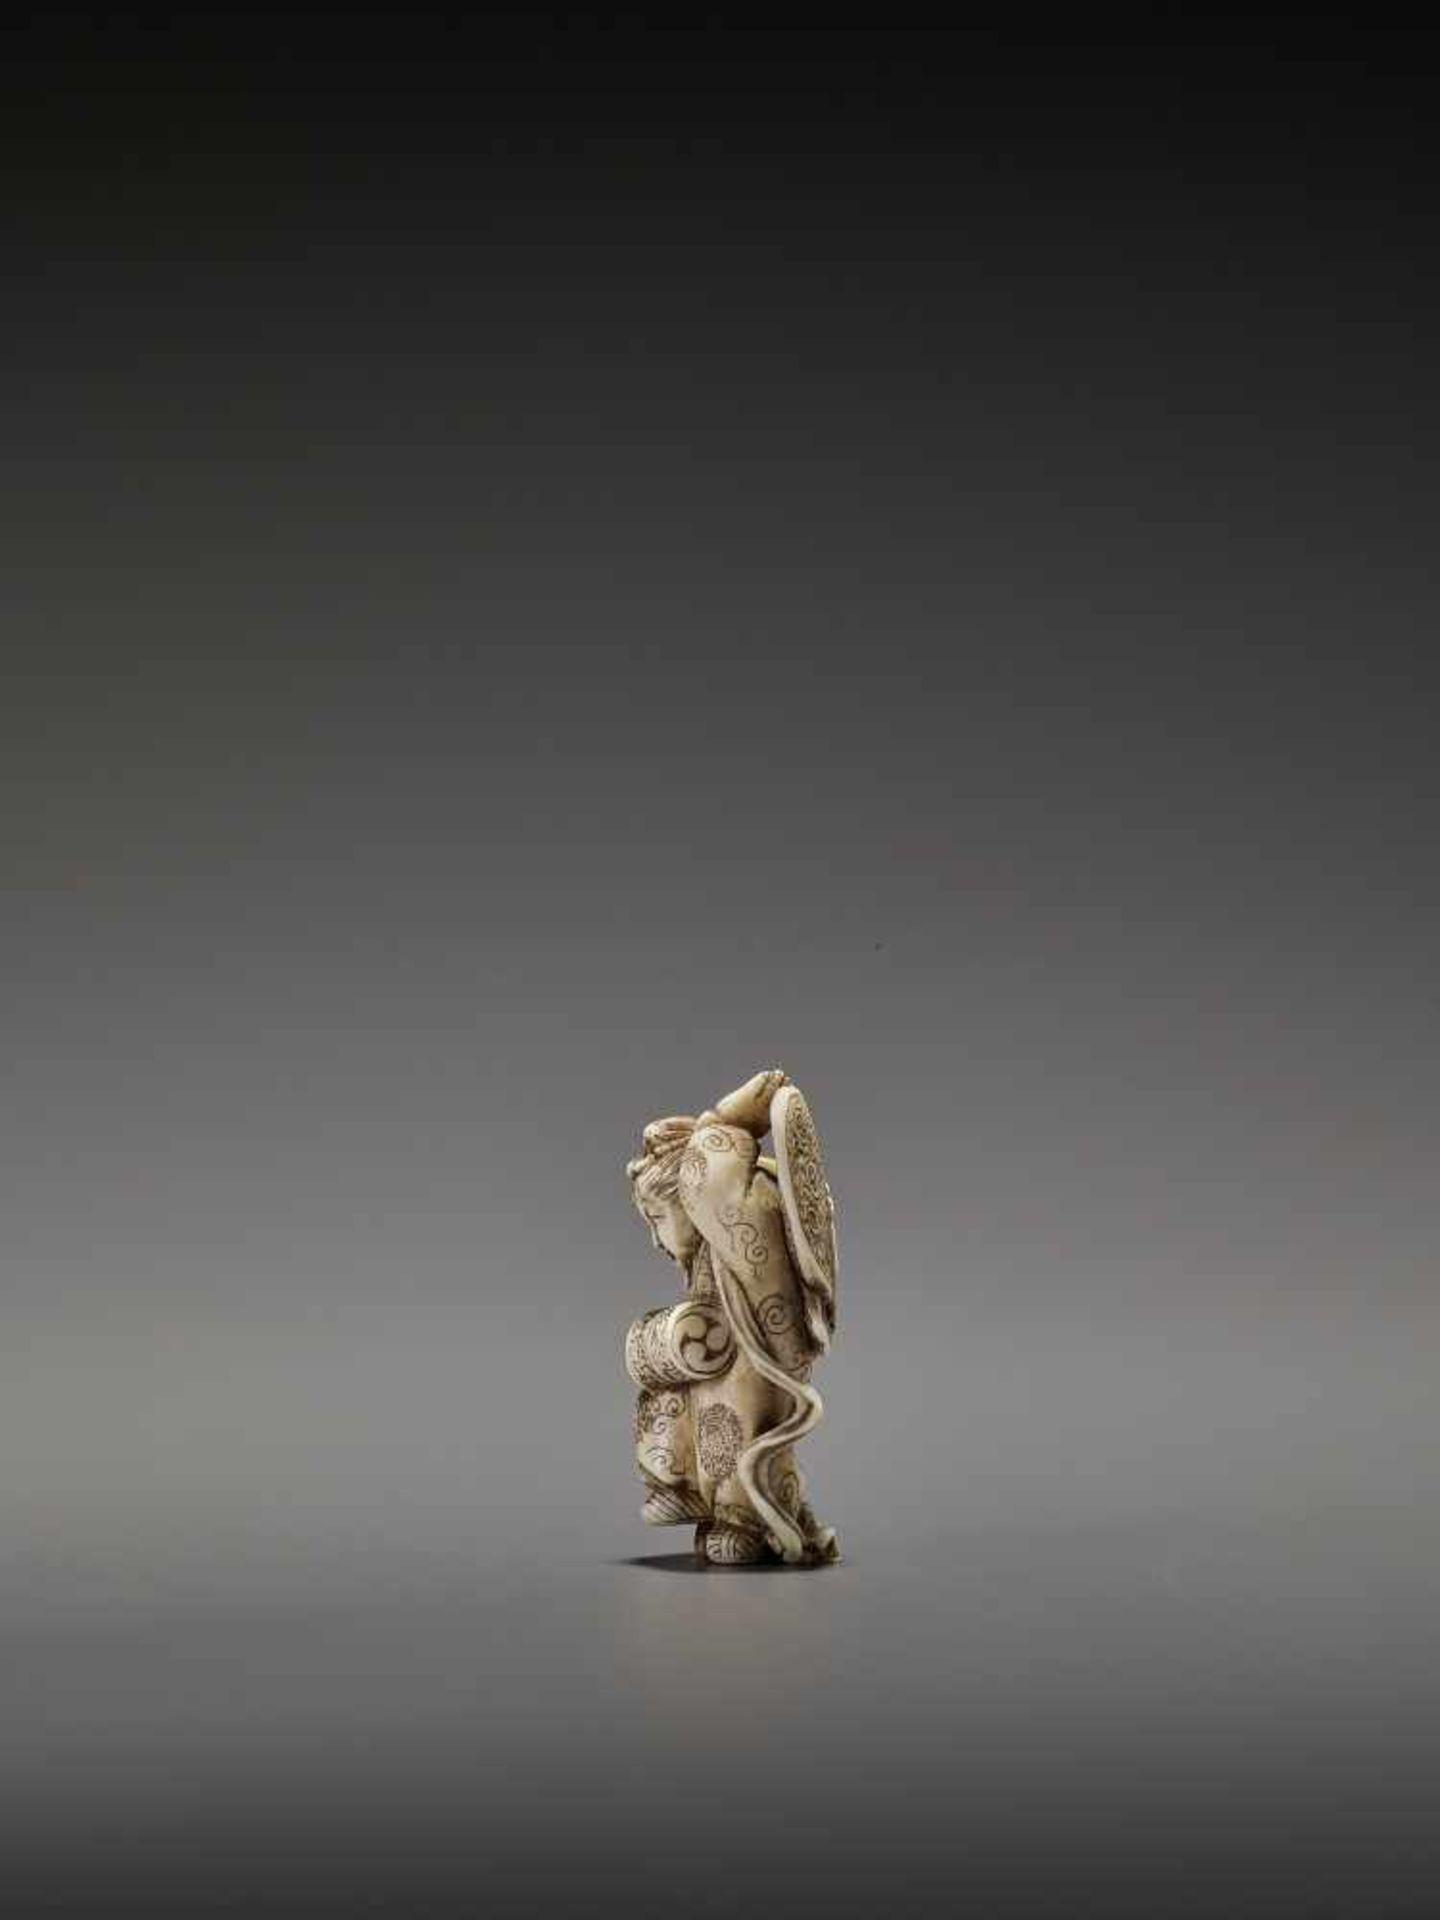 MASAHIRO: A VERY RARE IVORY NETSUKE OF A BUTTERFLY DANCER, KOCHO NO MAI By Masahiro, signed - Image 6 of 13